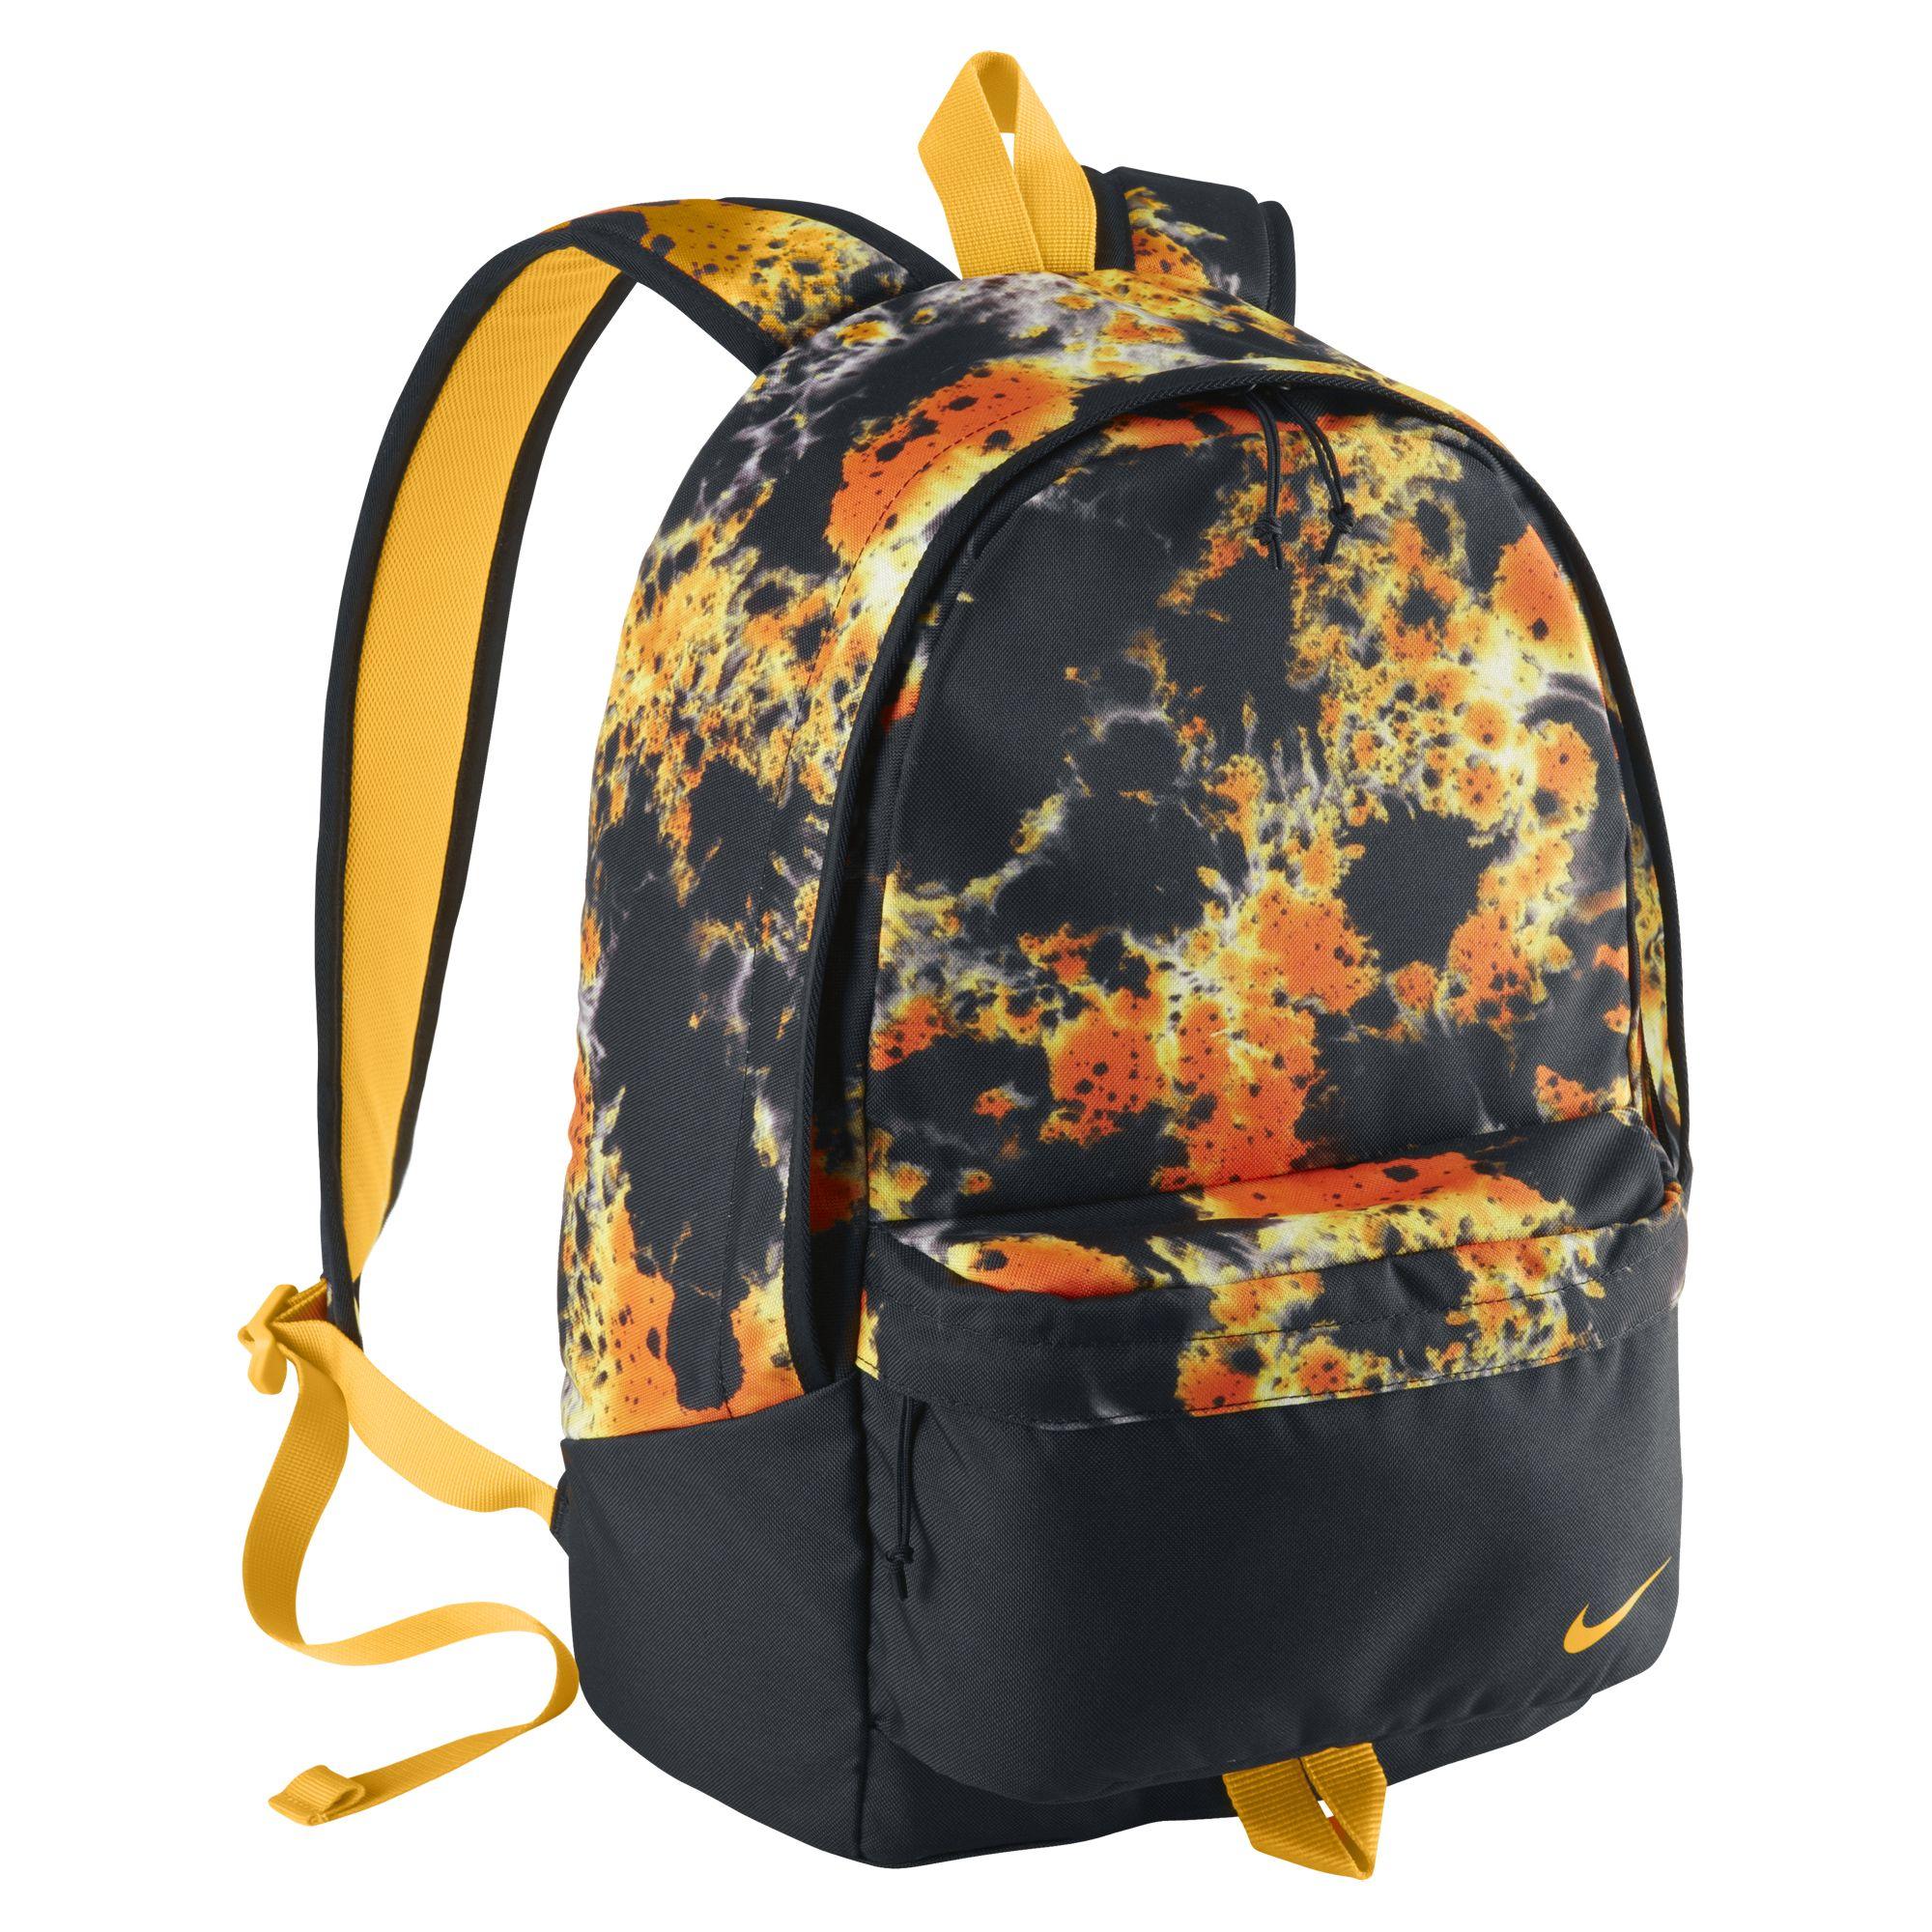 804630ec5b935 Plecak Nike Piedmont Black / Black / University Gold : Sklep AveBmx ...